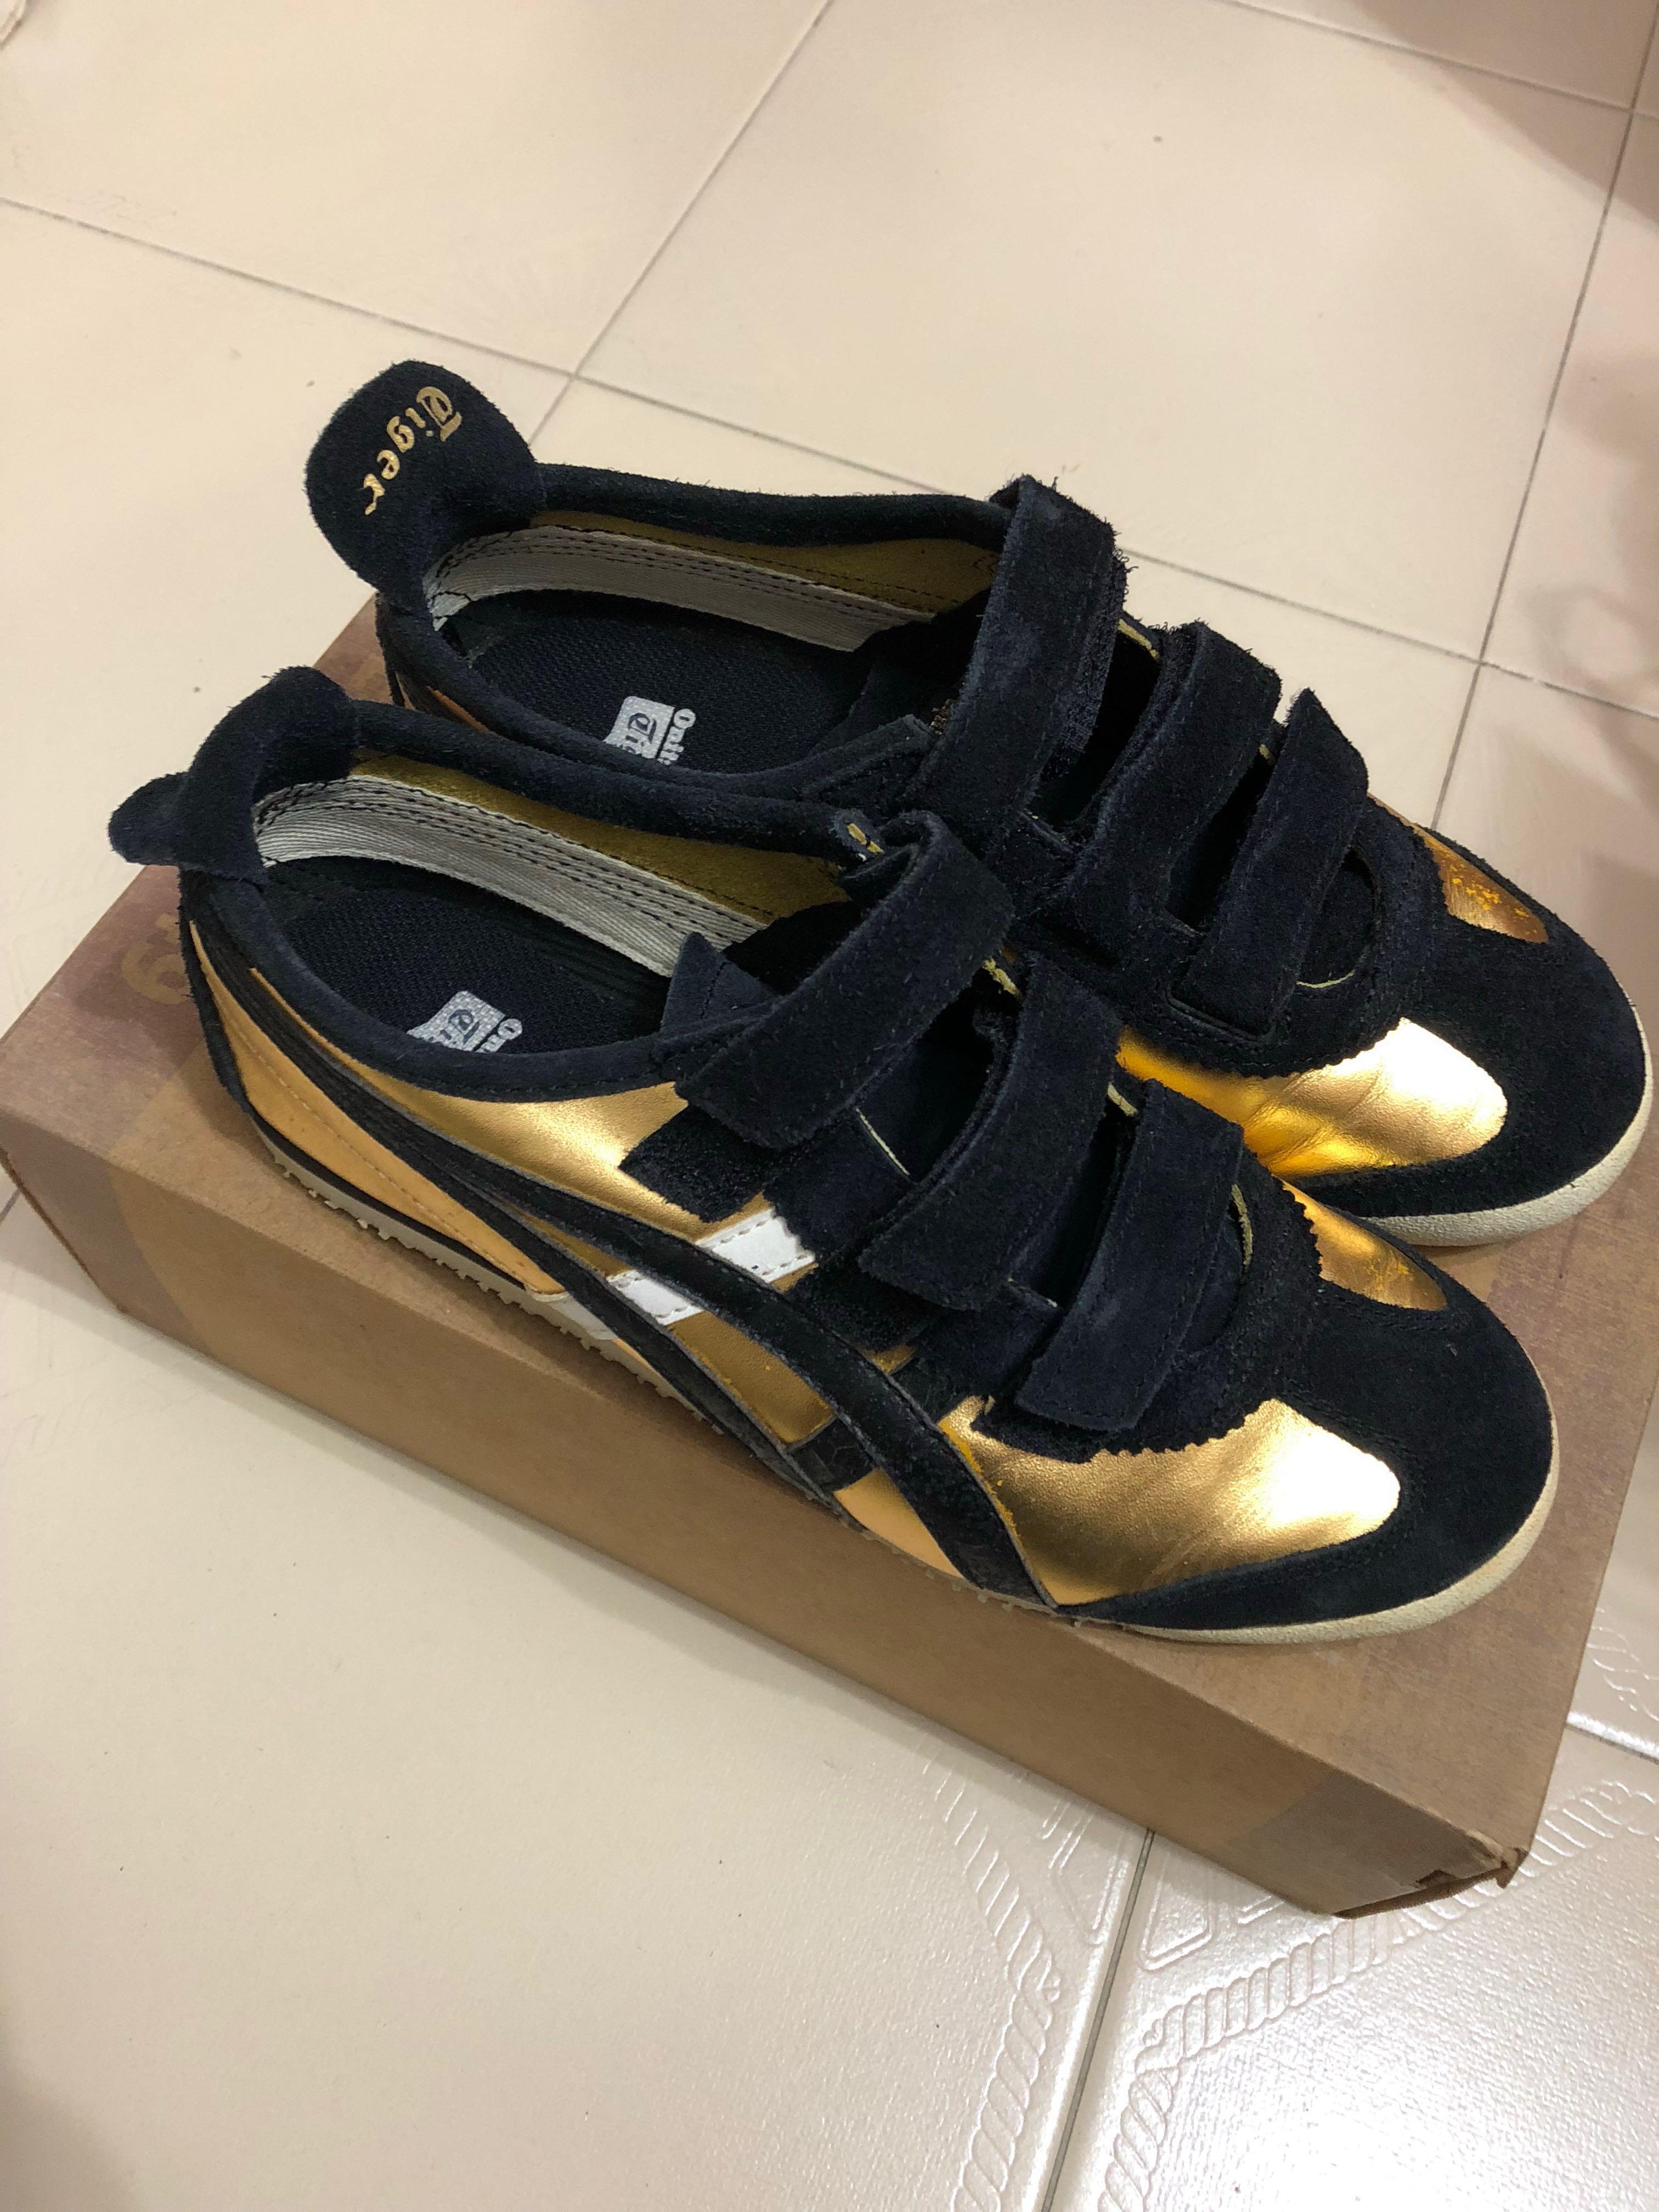 huge selection of 7965e 3f49b Onitsuka Tiger Gold Black, Women's Fashion, Shoes, Sneakers ...